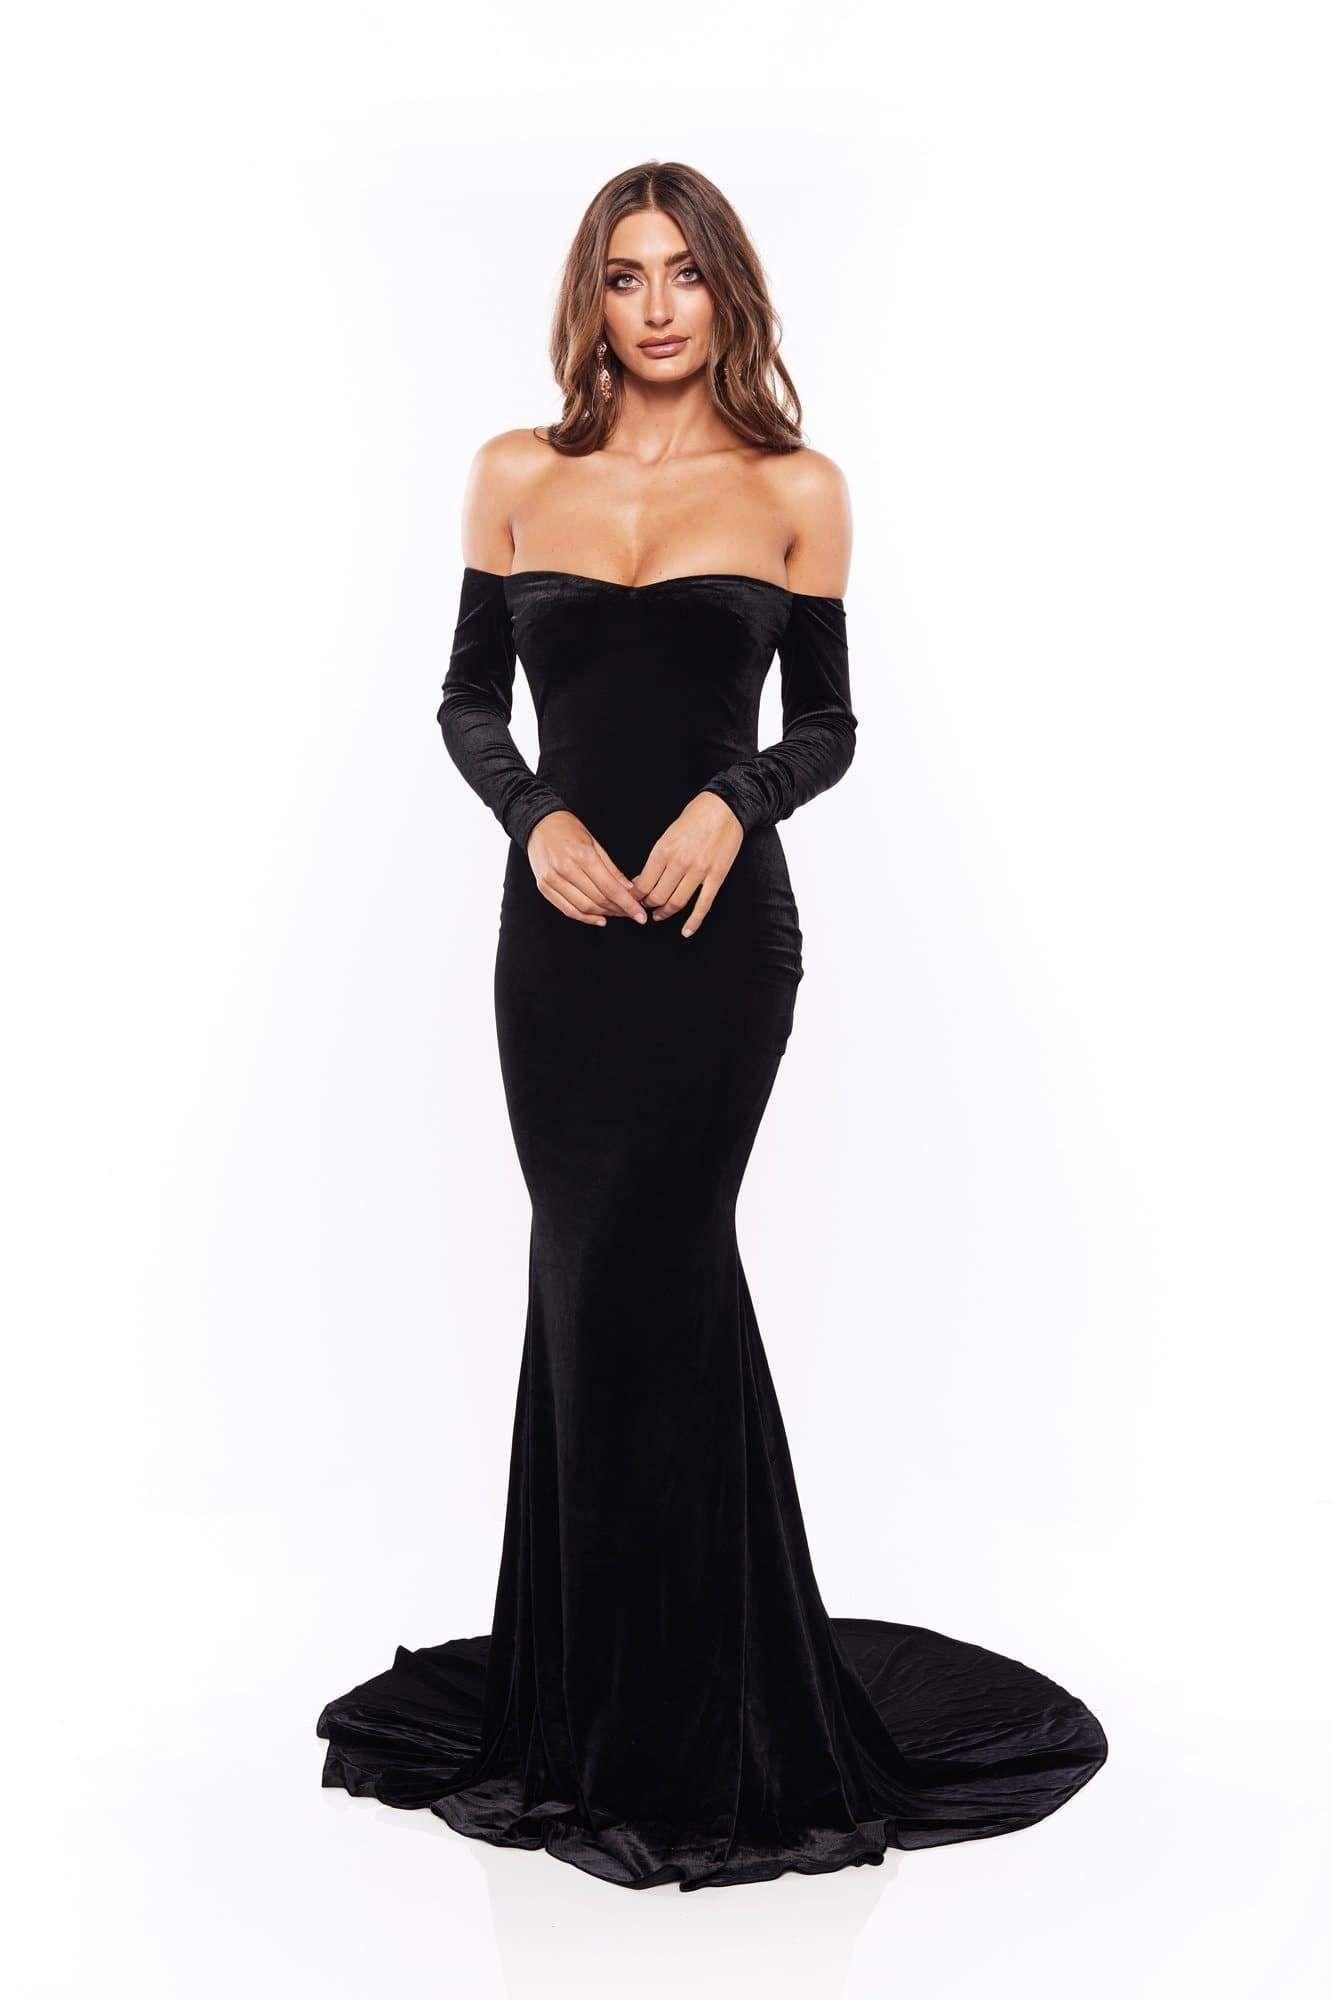 Cadencia Black Long Sleeve Velvet Gown With Mermaid Train Long Mermaid Dress Strapless Dress Formal Long Sleeve Dress [ 2000 x 1333 Pixel ]